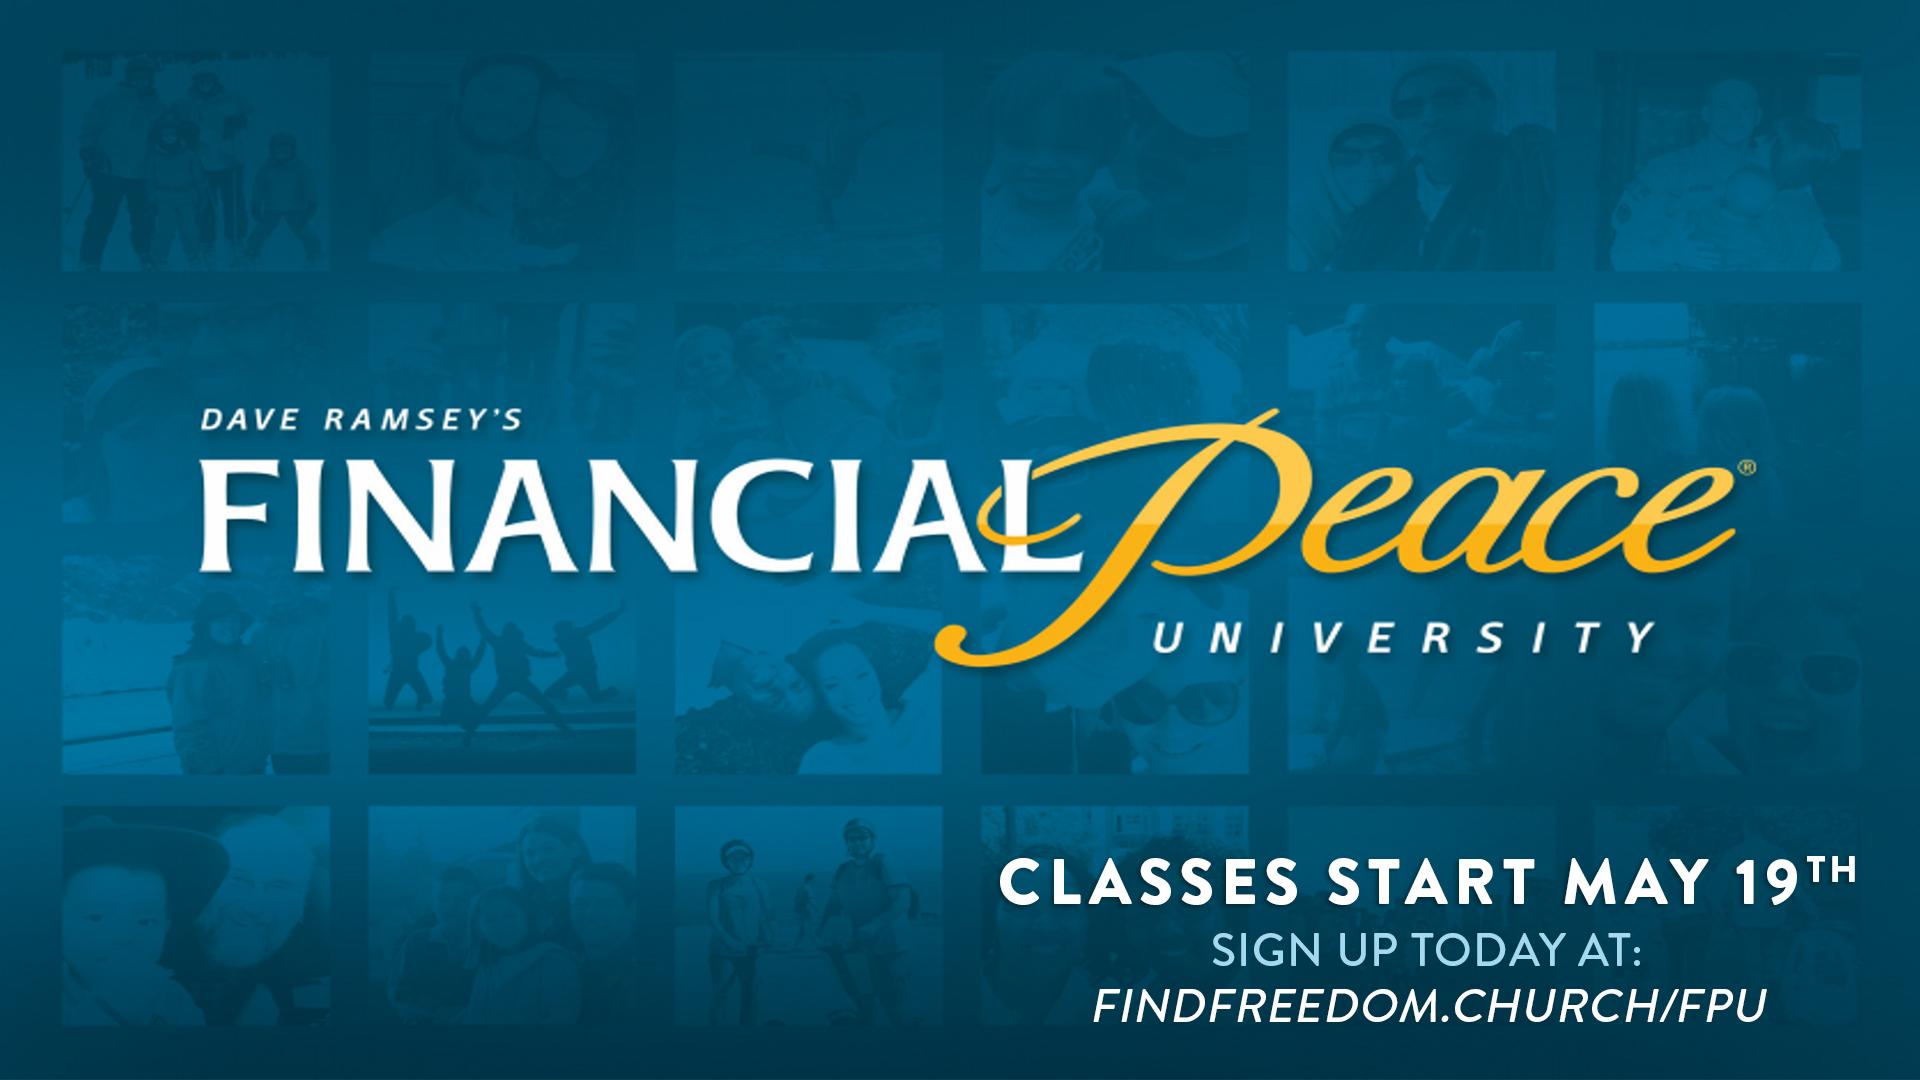 Financial-peace1.jpg